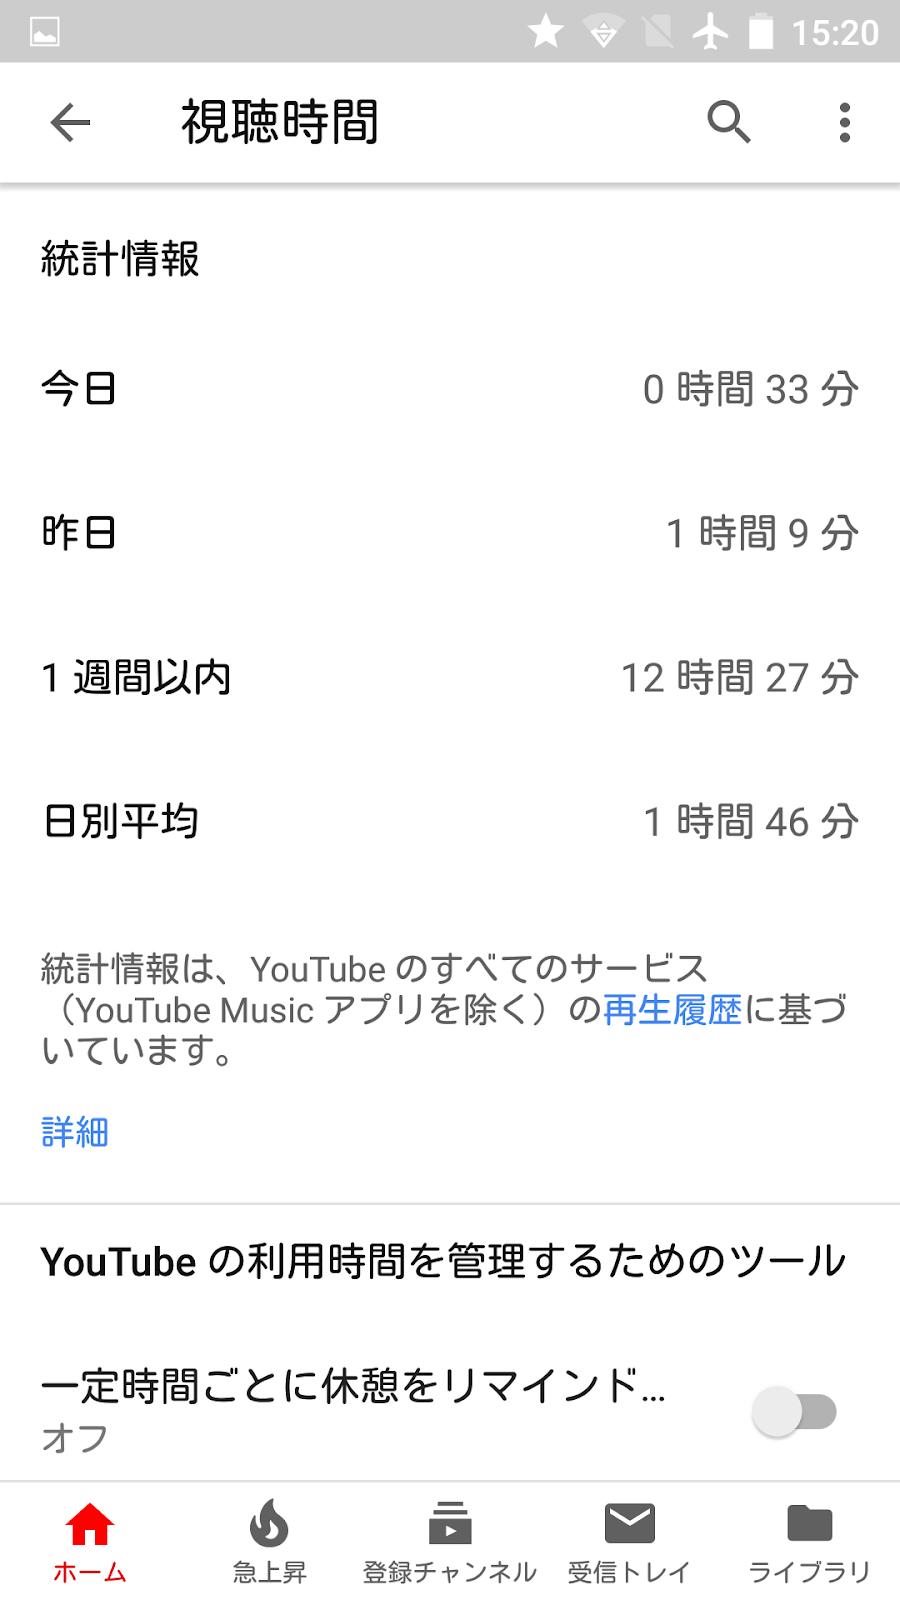 Youtube視聴時間の確認